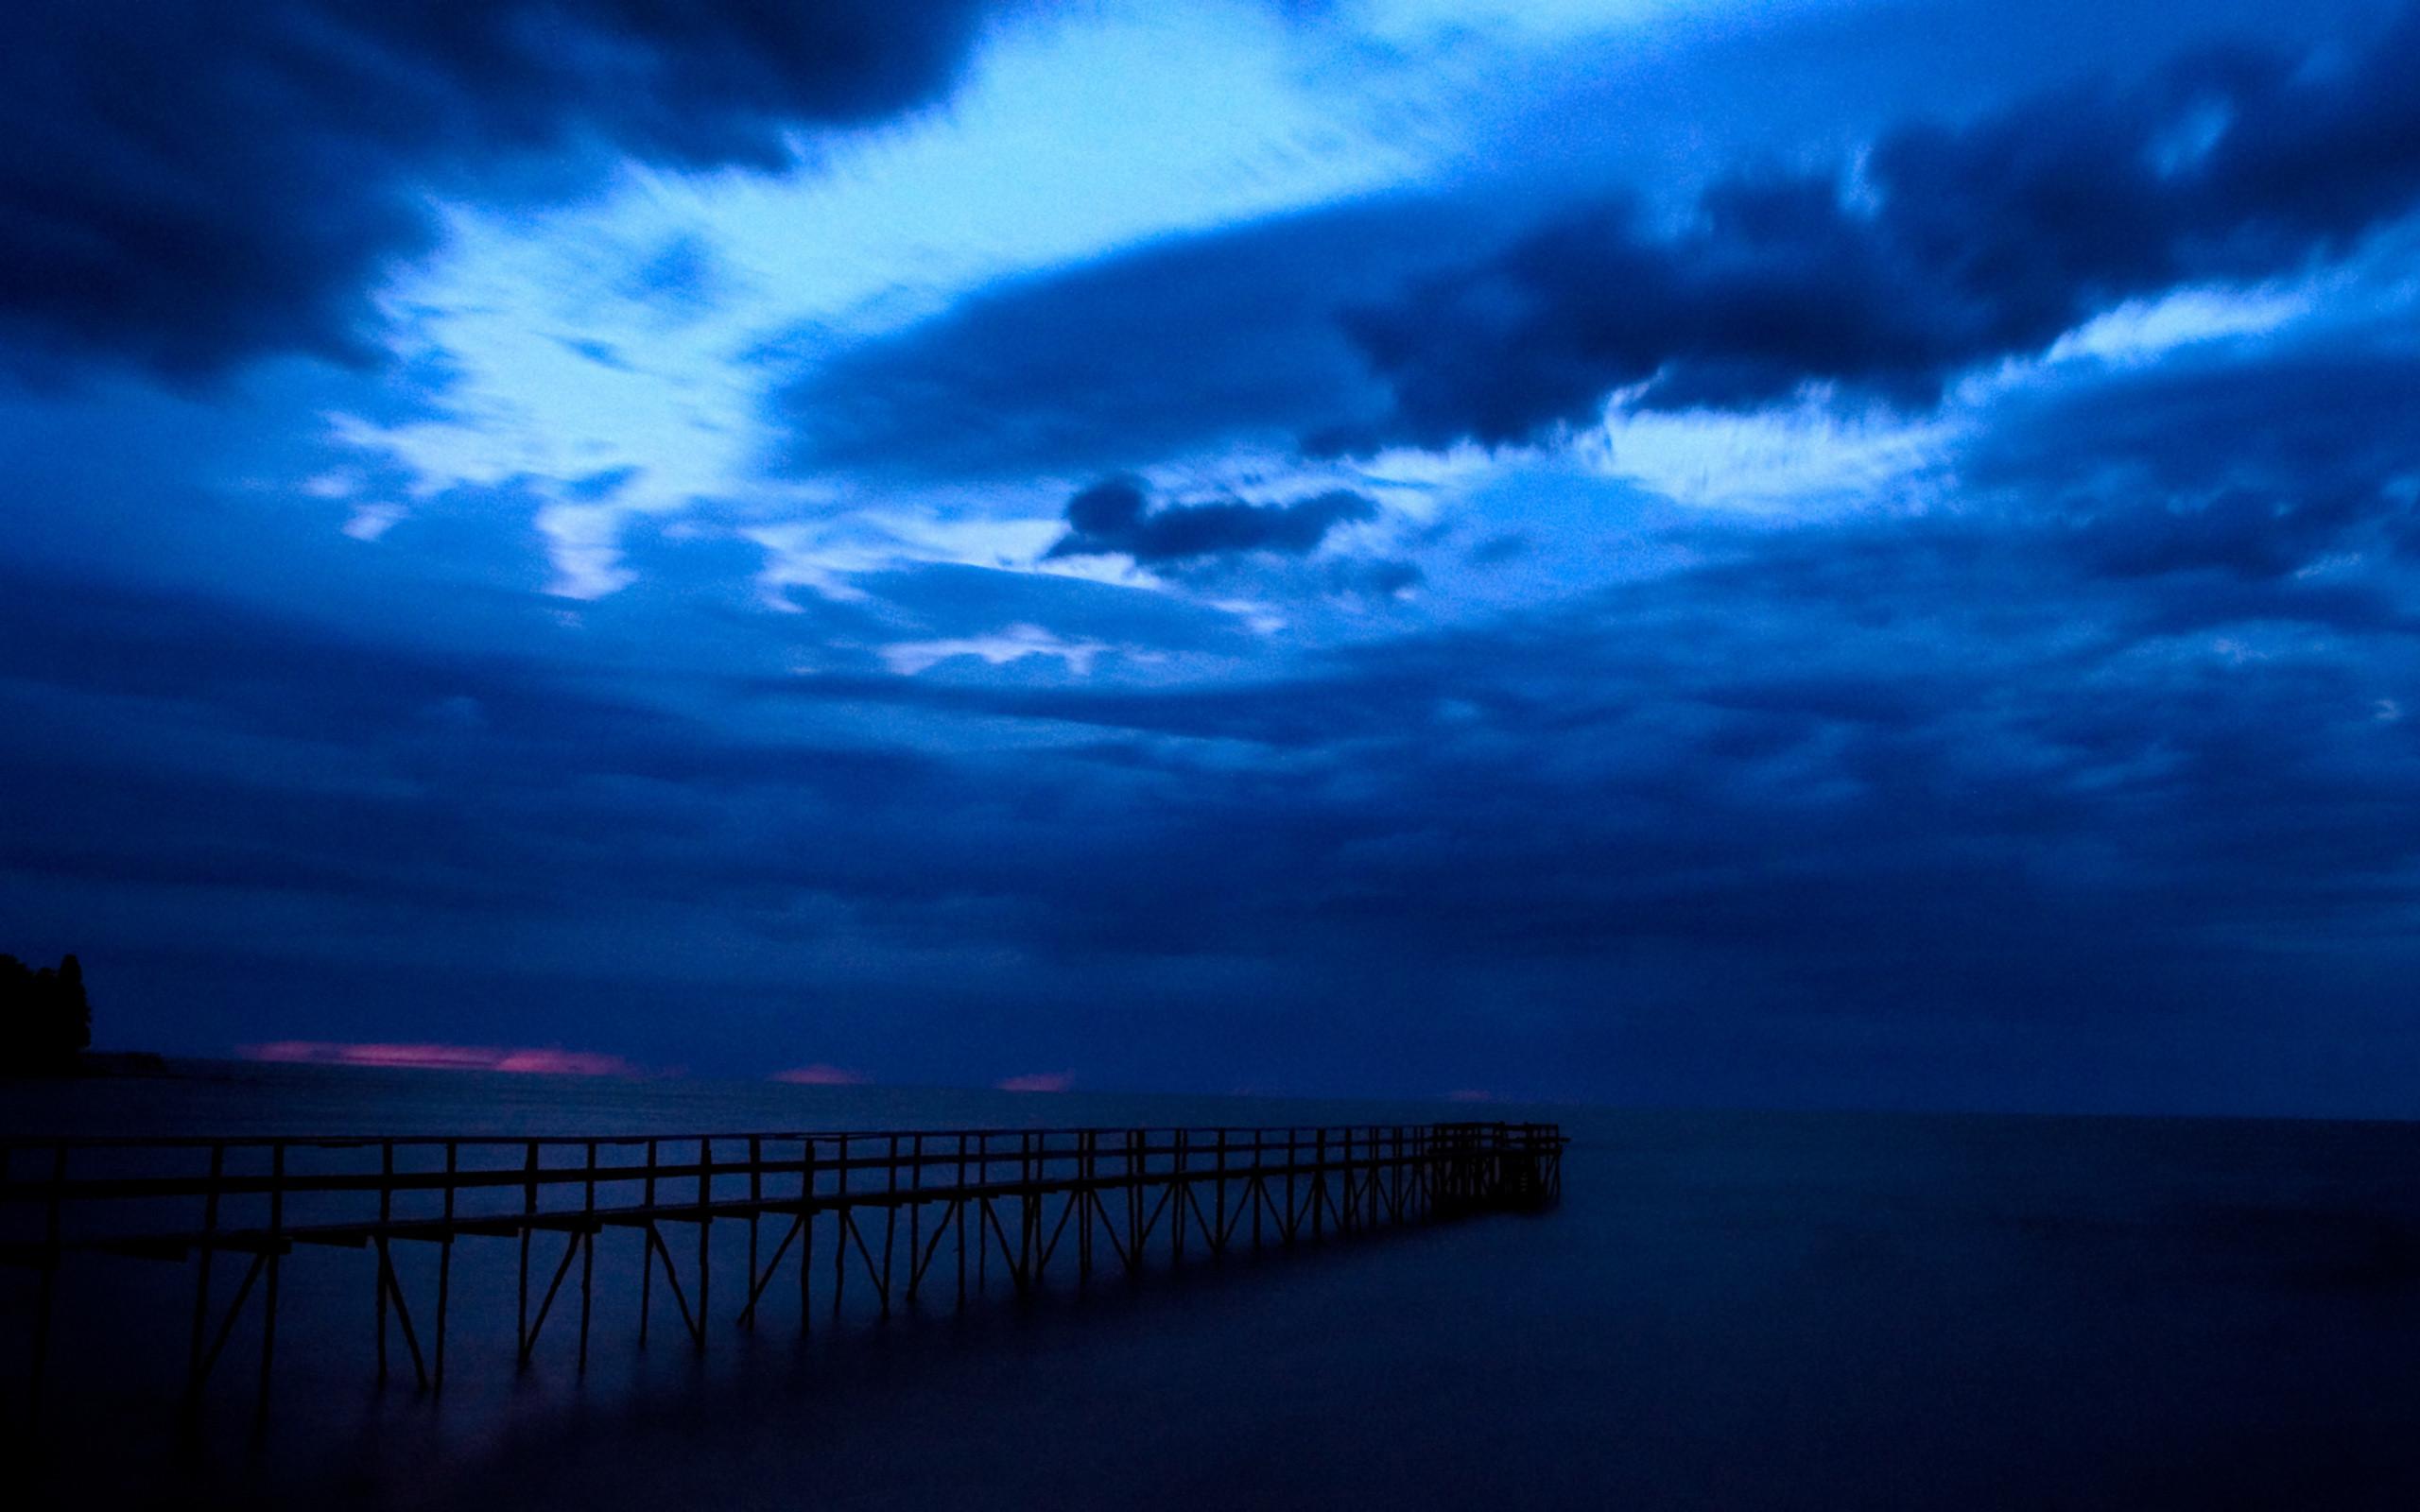 Nature Wallpaper: Dark Blue Sky Wallpapers Photo for HD Wallpaper Desktop